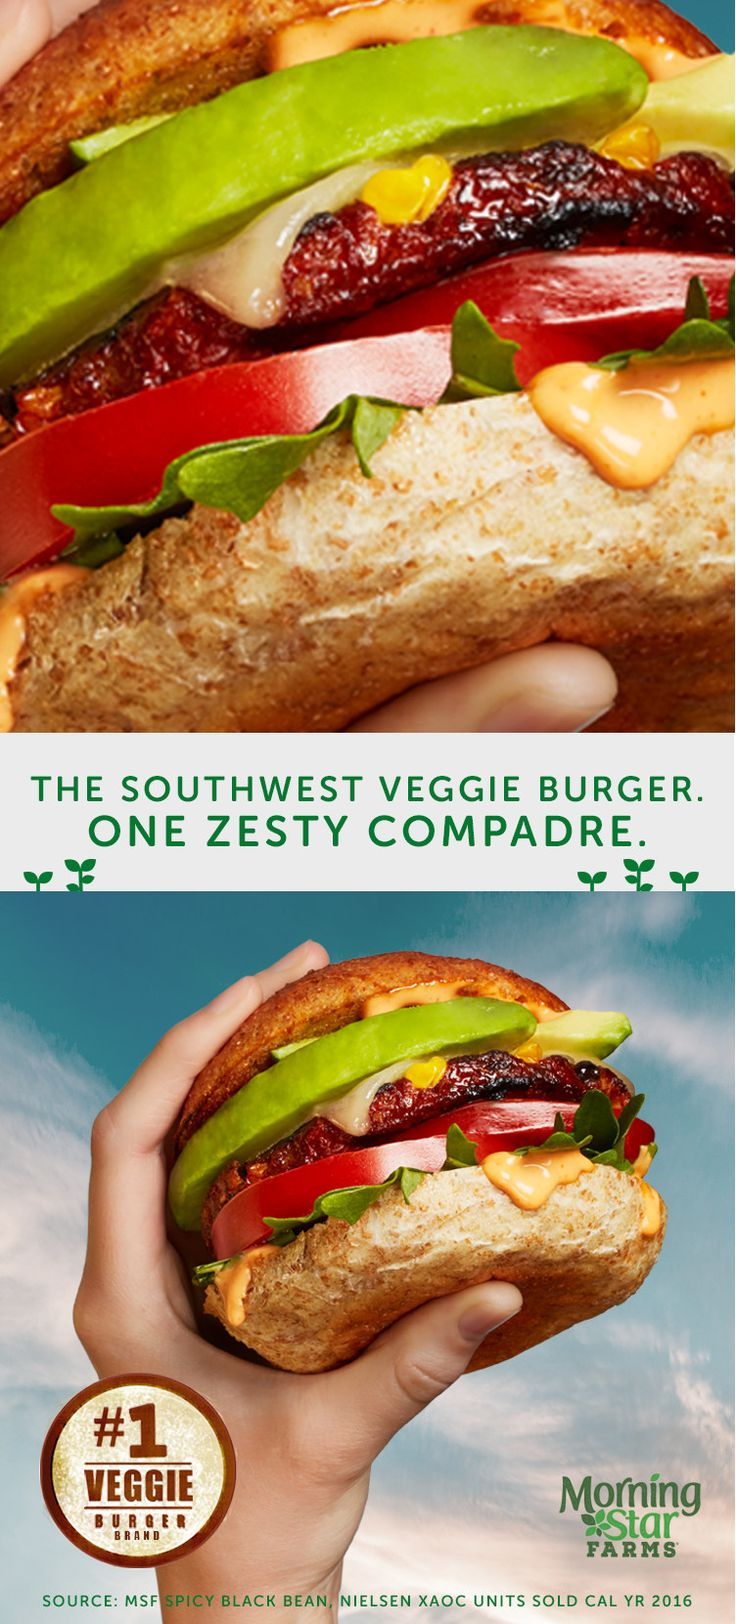 Taste the reason it's America's #1 Veggie Burger